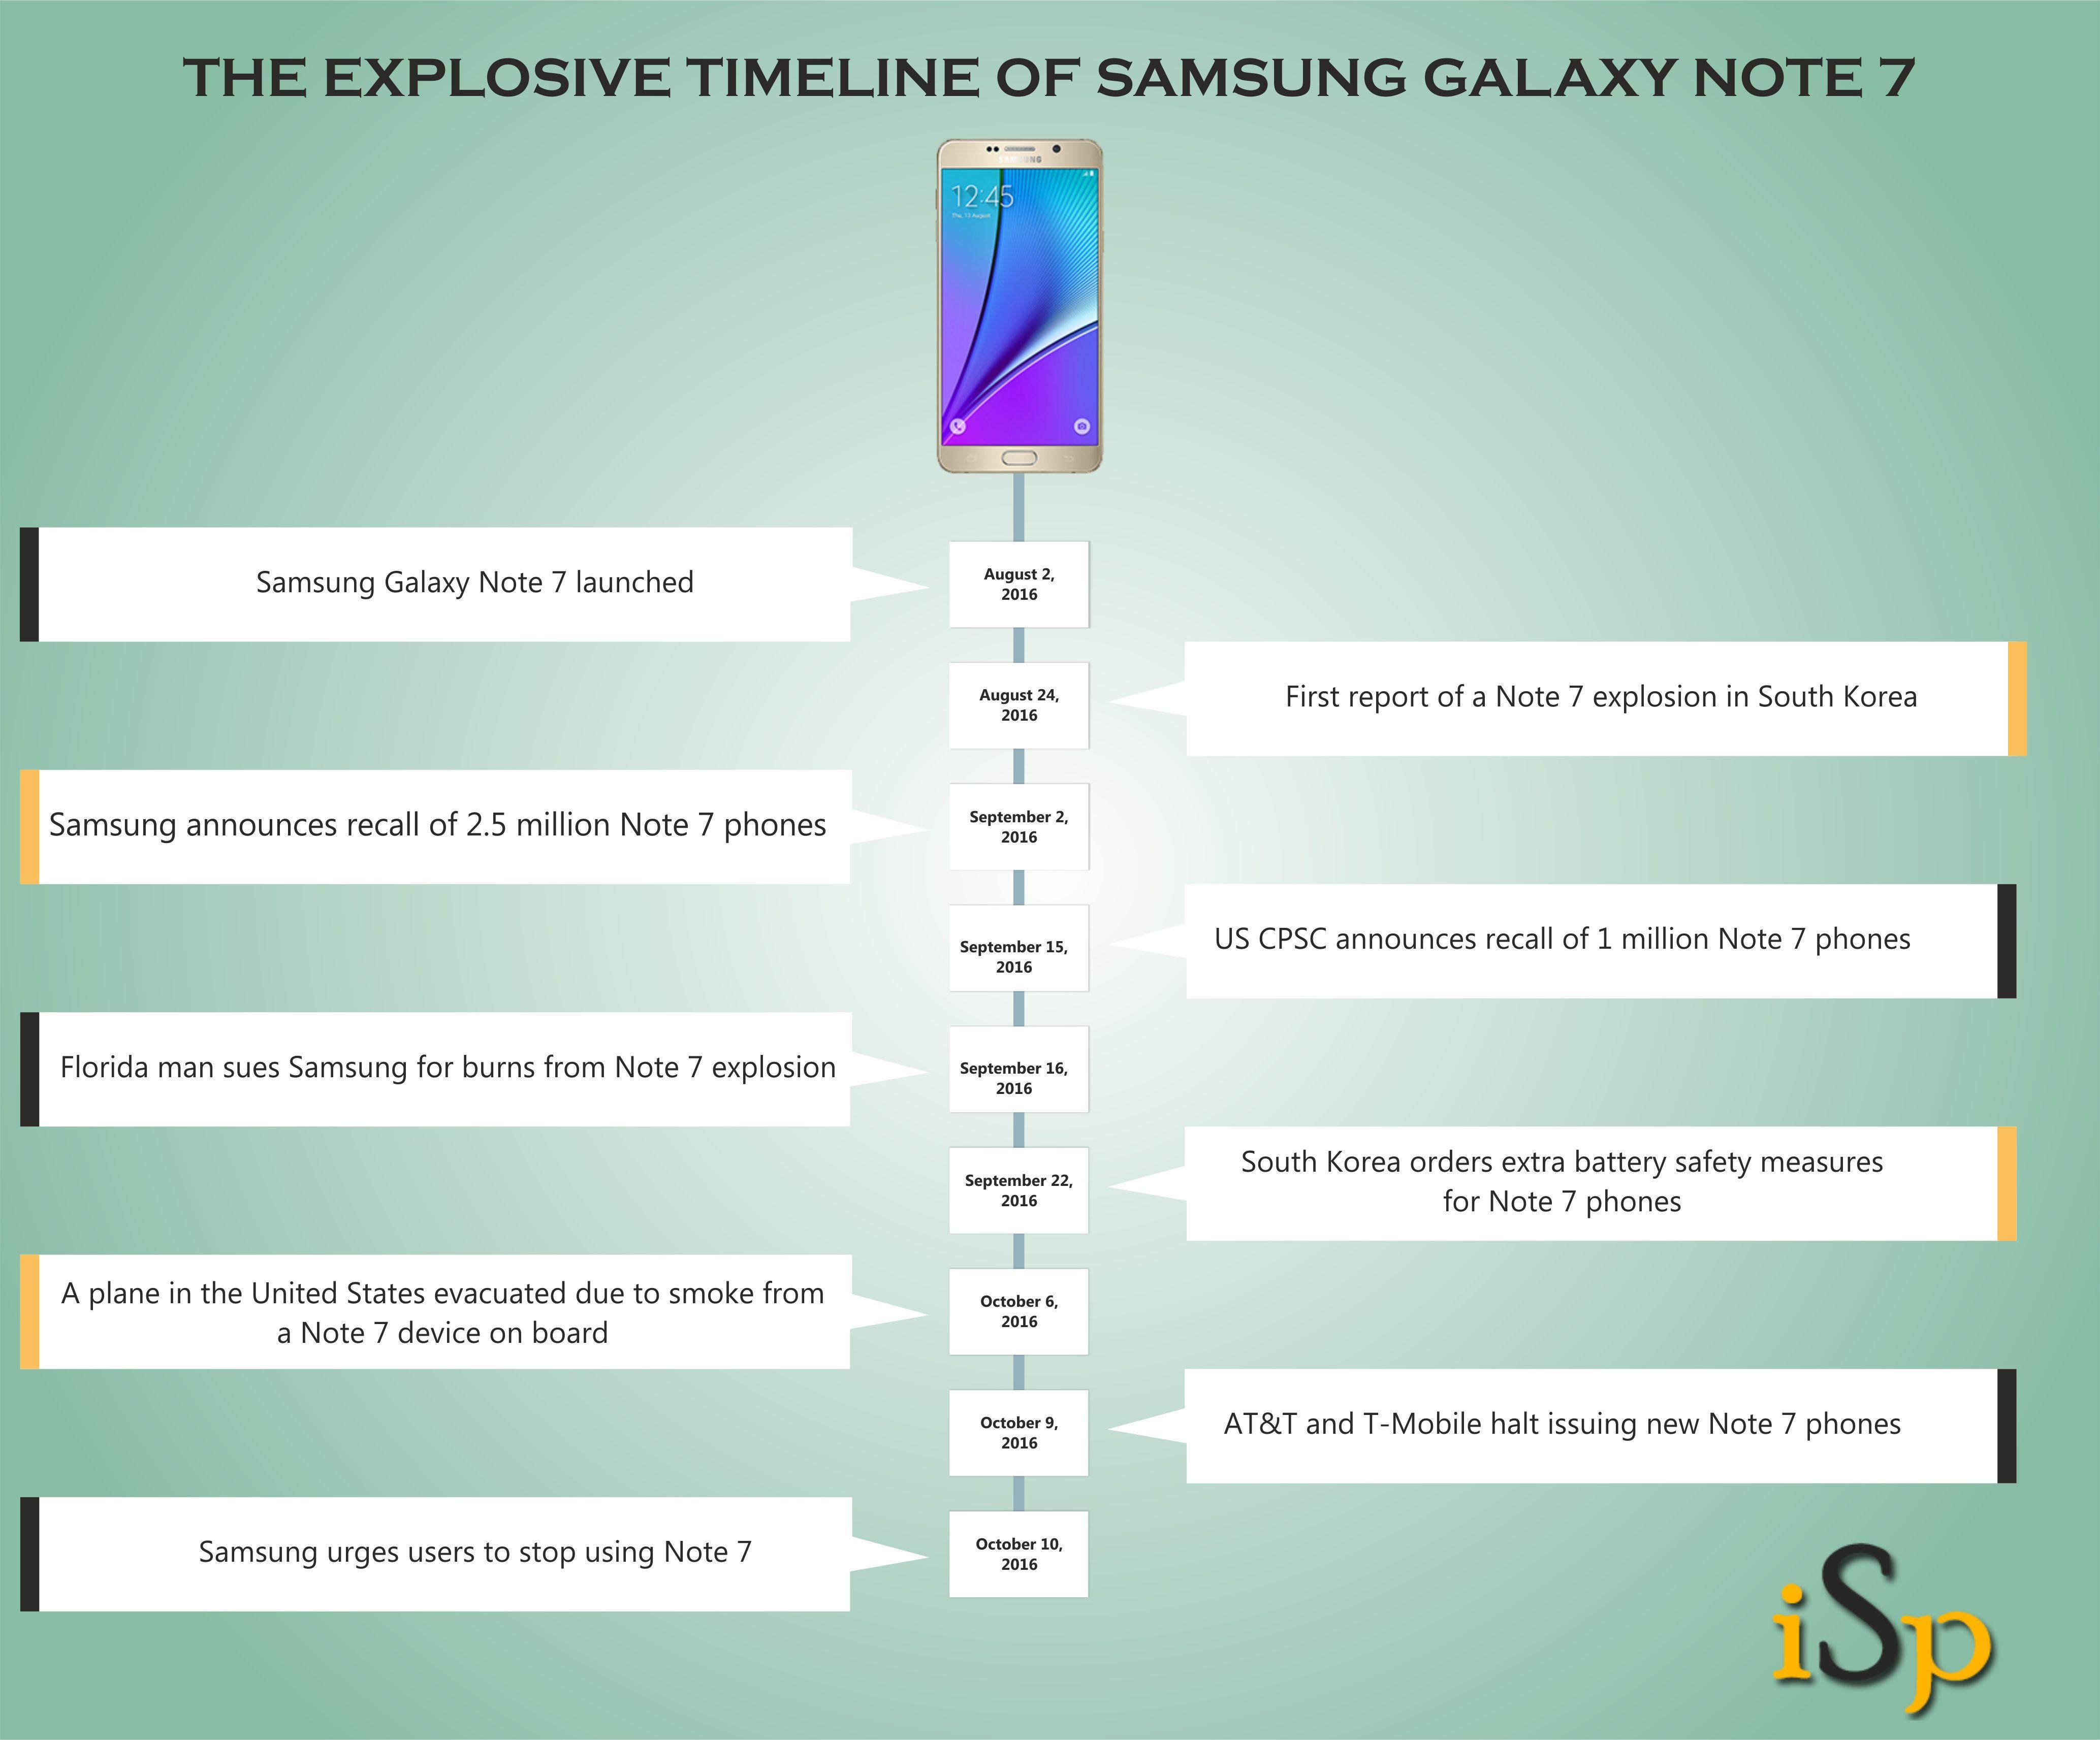 samsung-galaxy-note-7-timeline